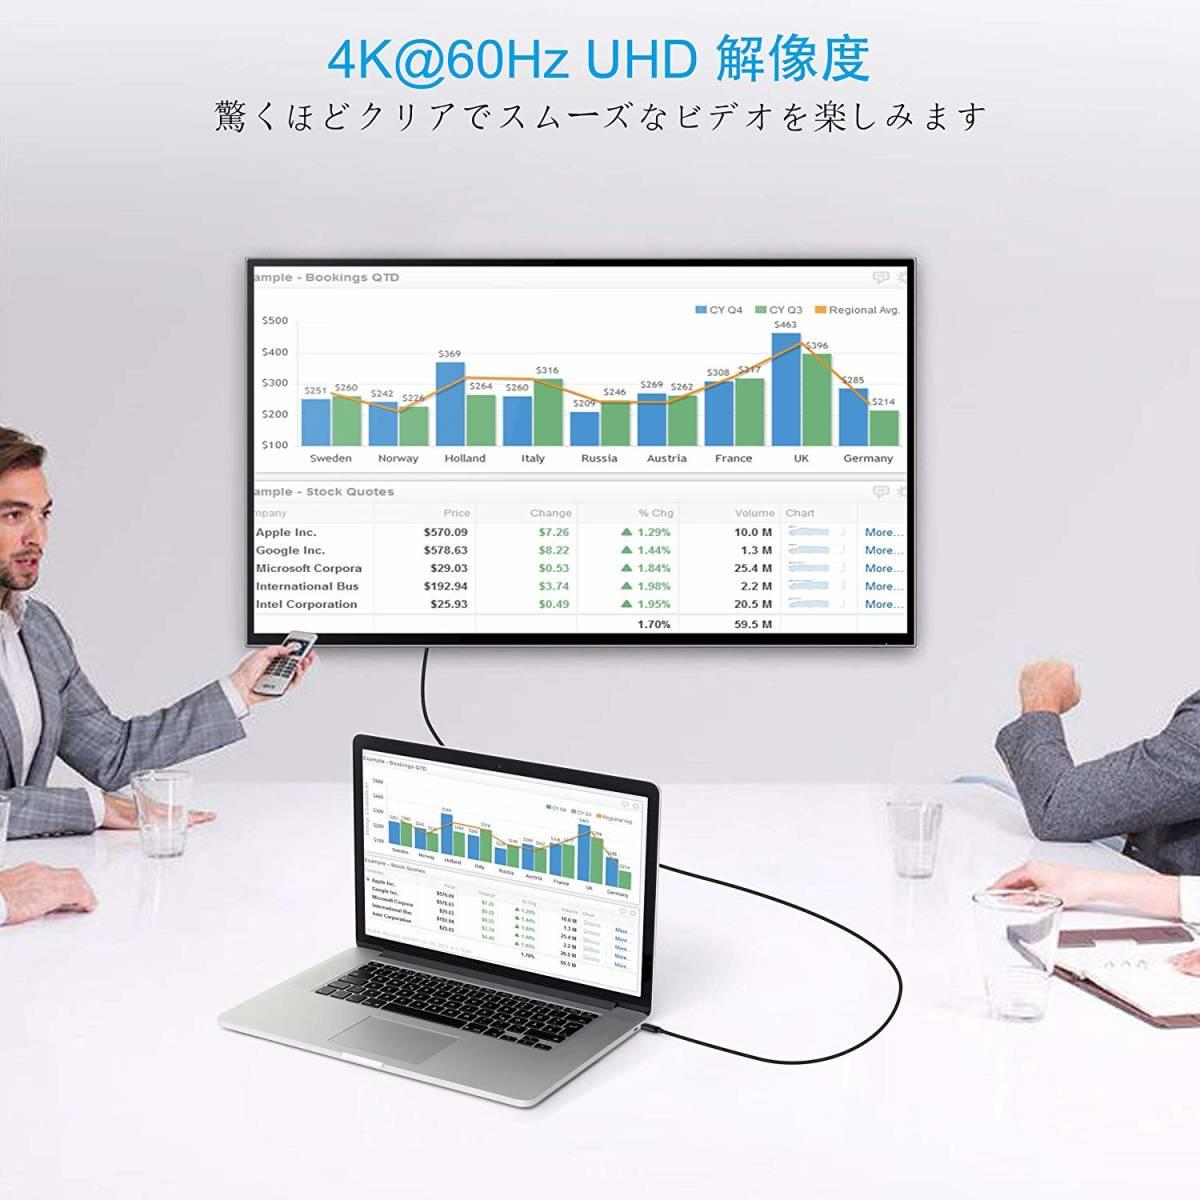 新品●USB C to HDMI、CHOETECH 4K @ 60Hz 1.8m / 6ft USB C to HDMIケーブルThunderbolt 3対応CタイプHDMIケーブル V3666_画像5